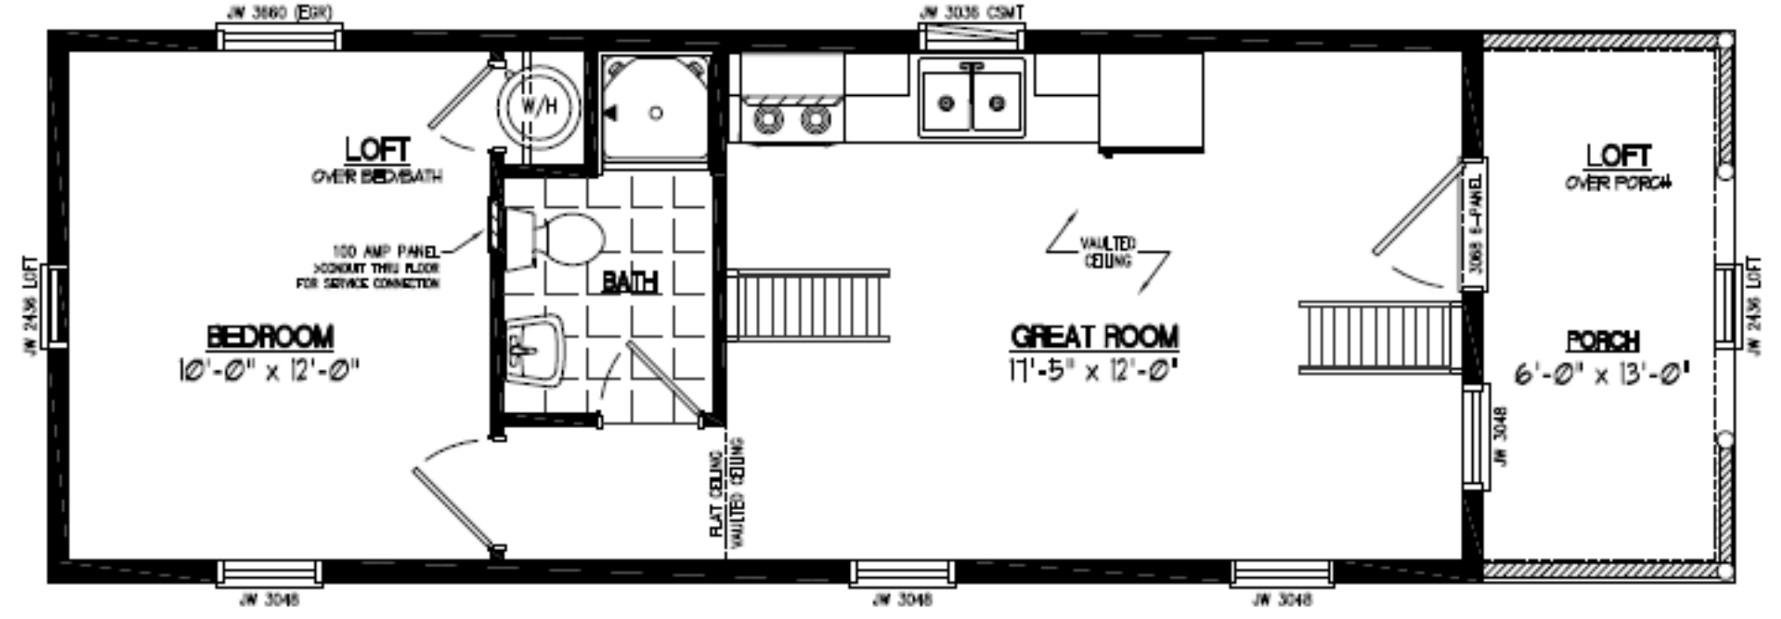 Adirondack Floor Plan 13AR803